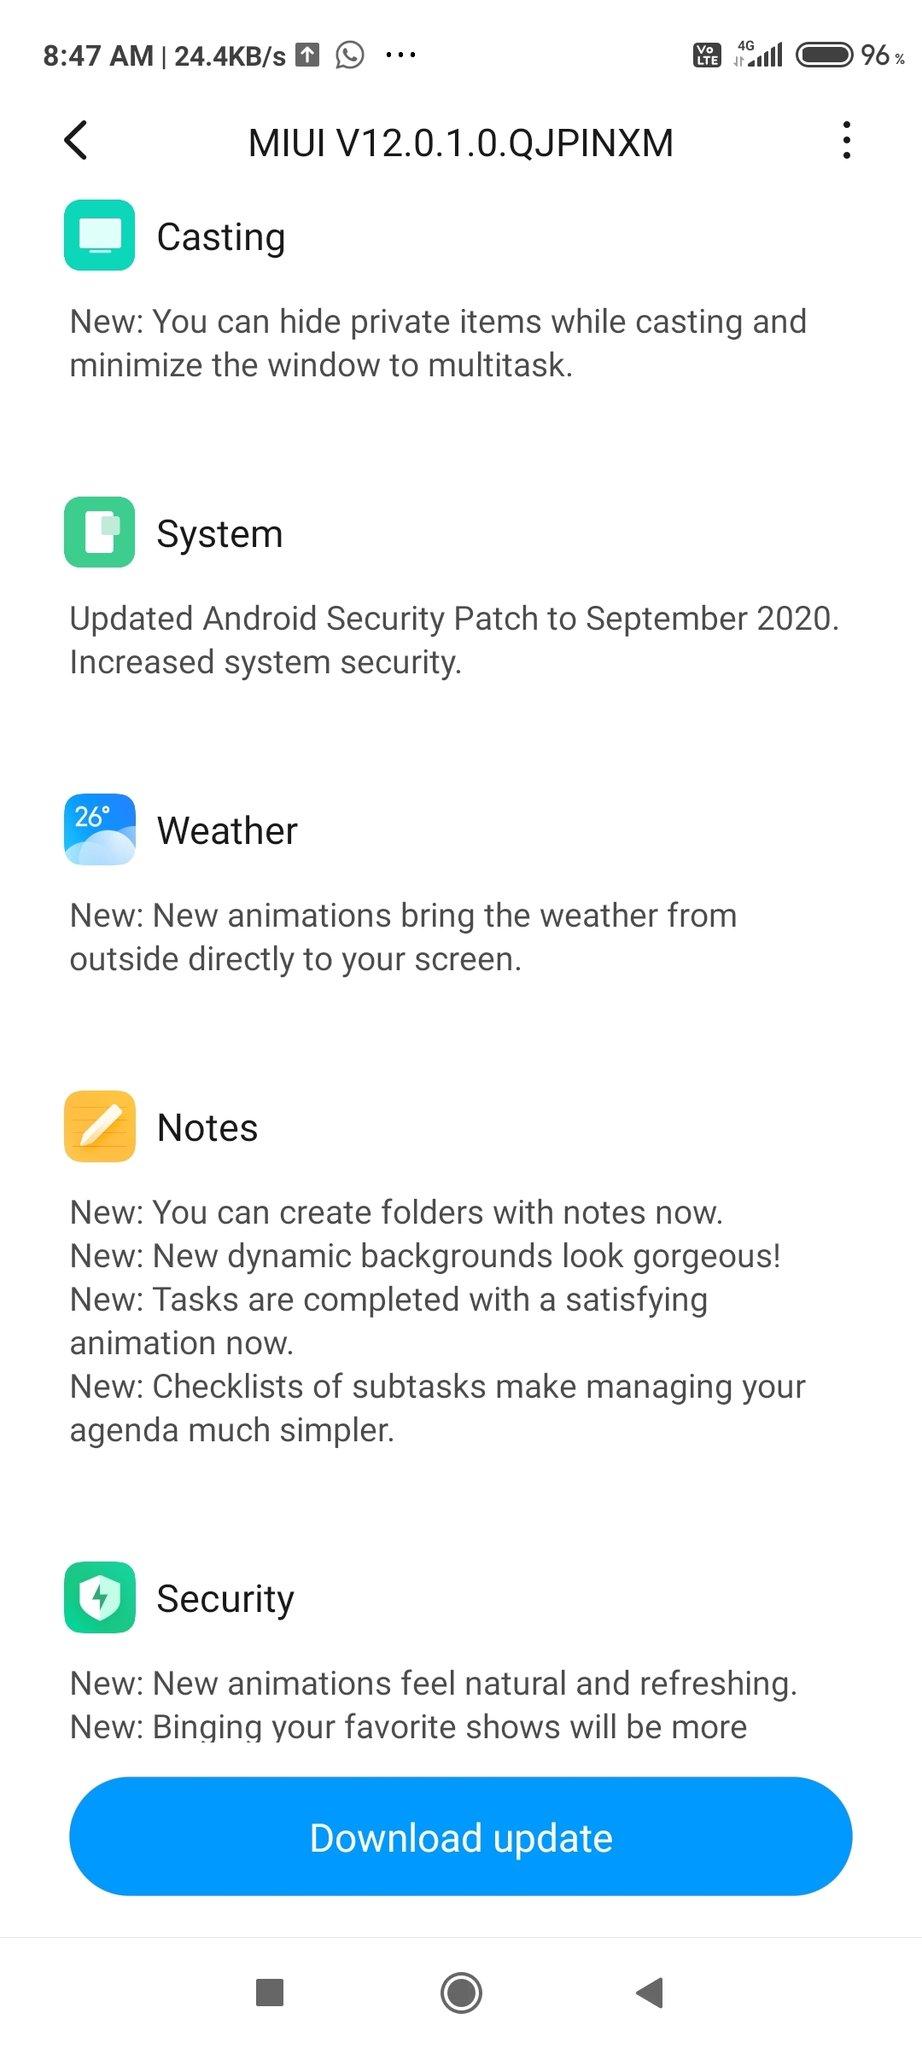 Poco M2 Pro MIUI 12 Update what's new 2